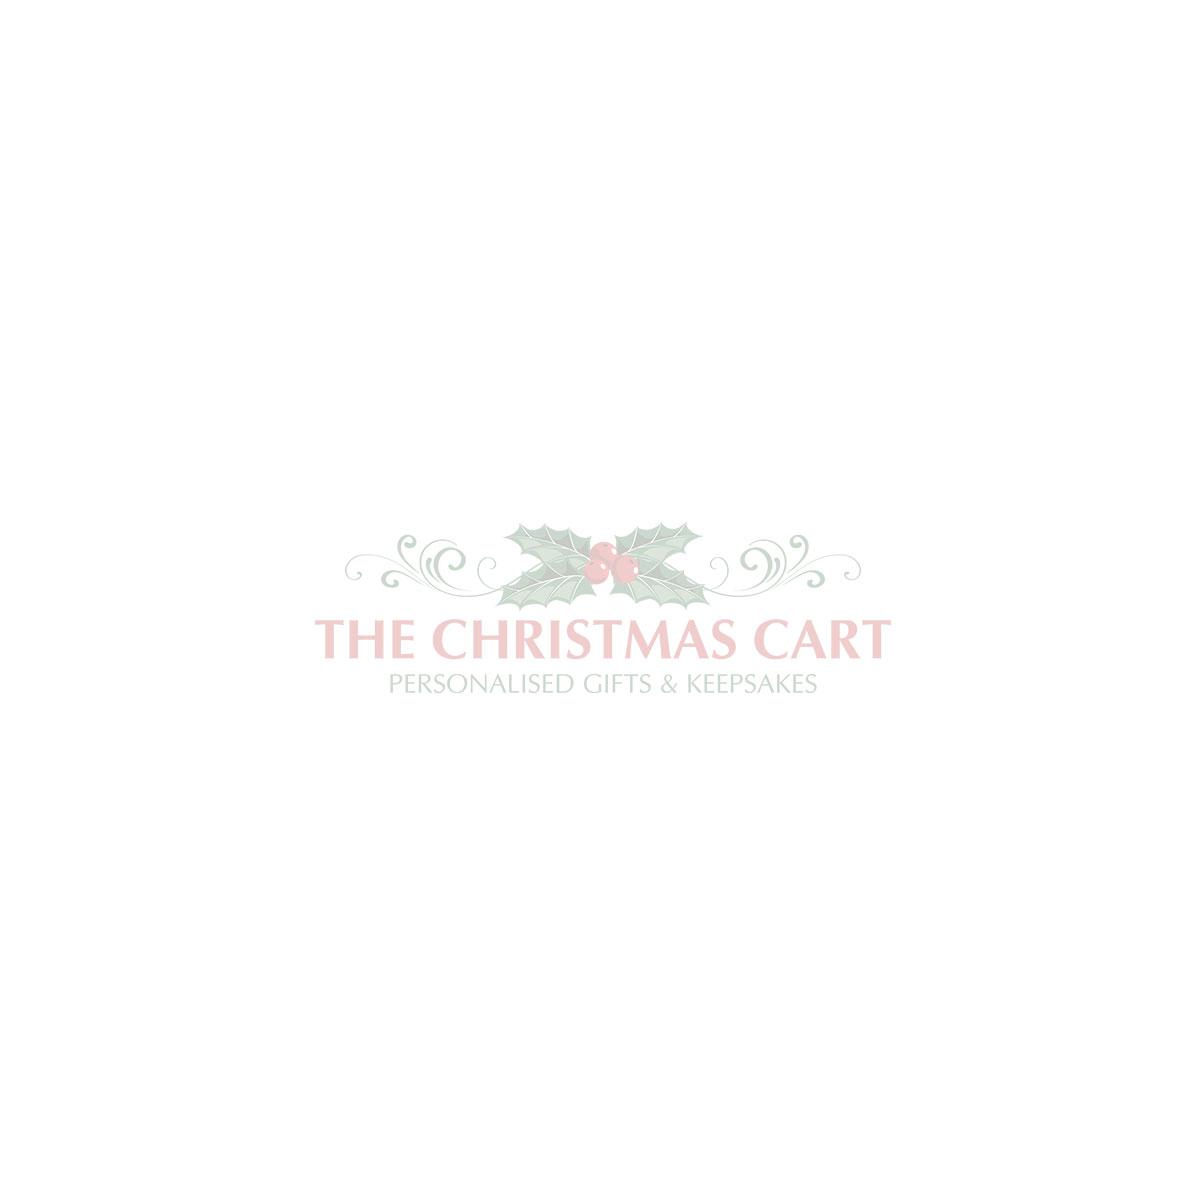 Thursday 14th November @ 11am - Gold Hoop Christmas Wreath Workshop